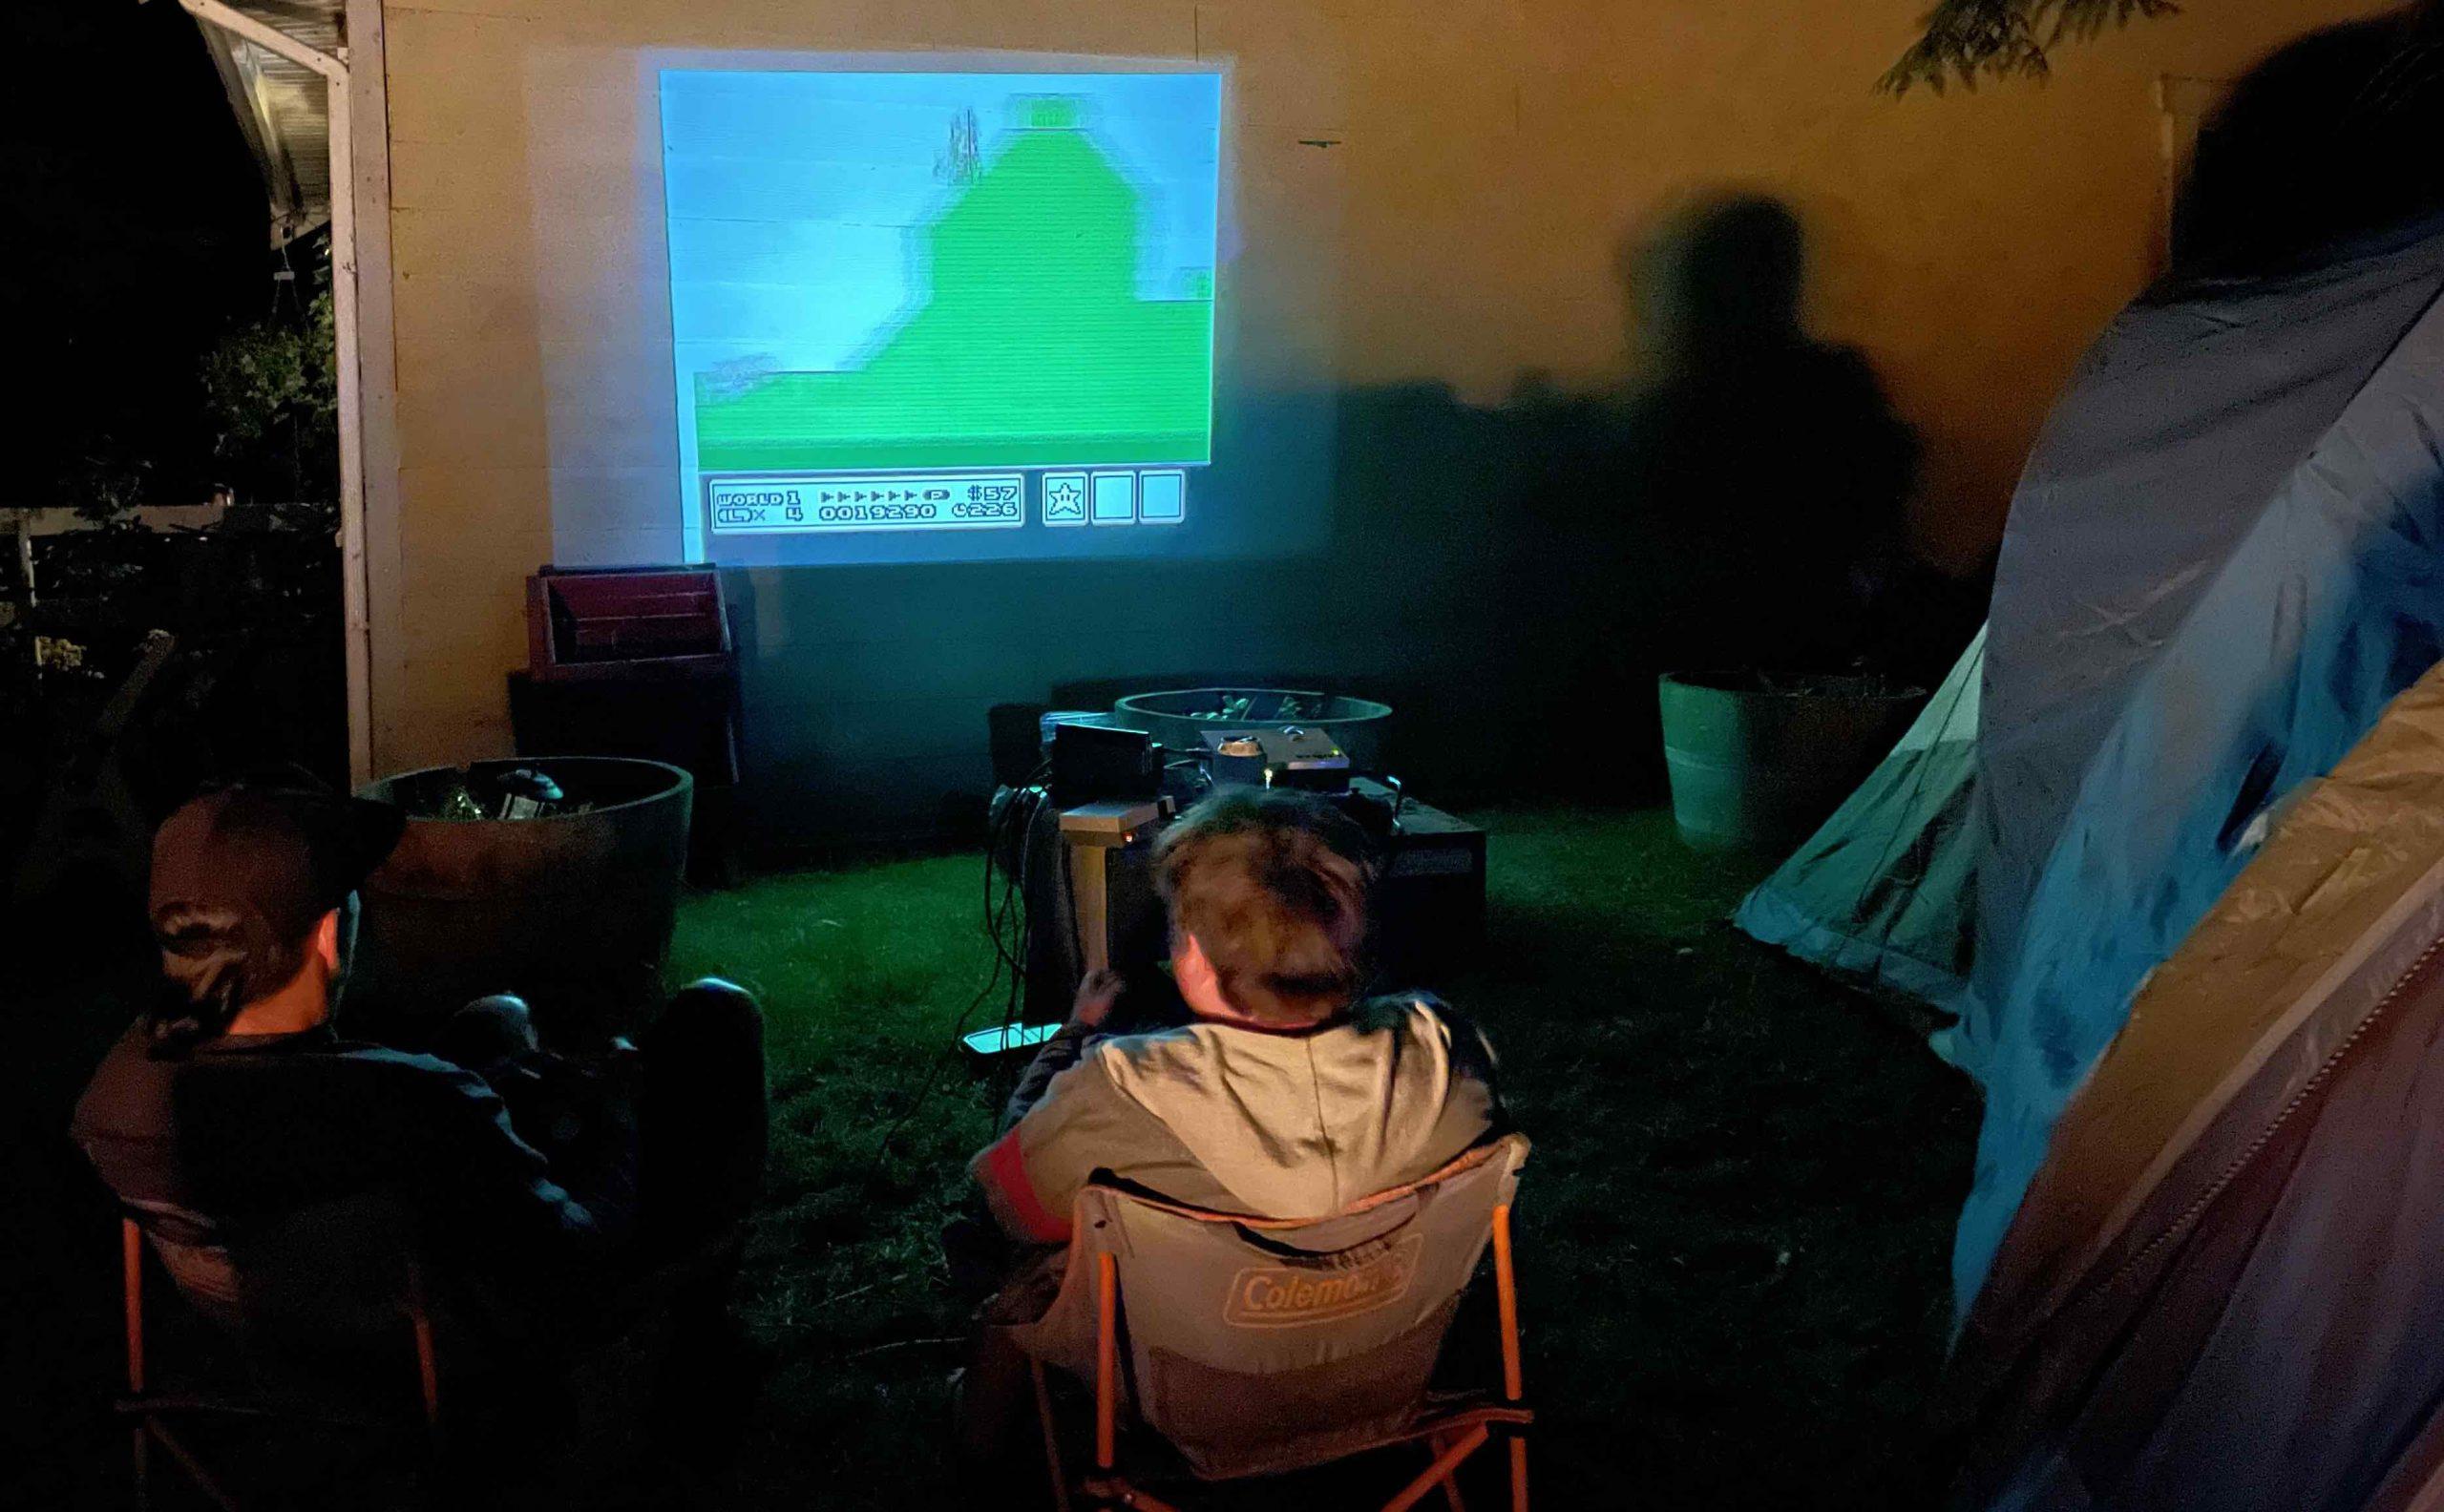 Vankyo leisure 3W review outdoor projector